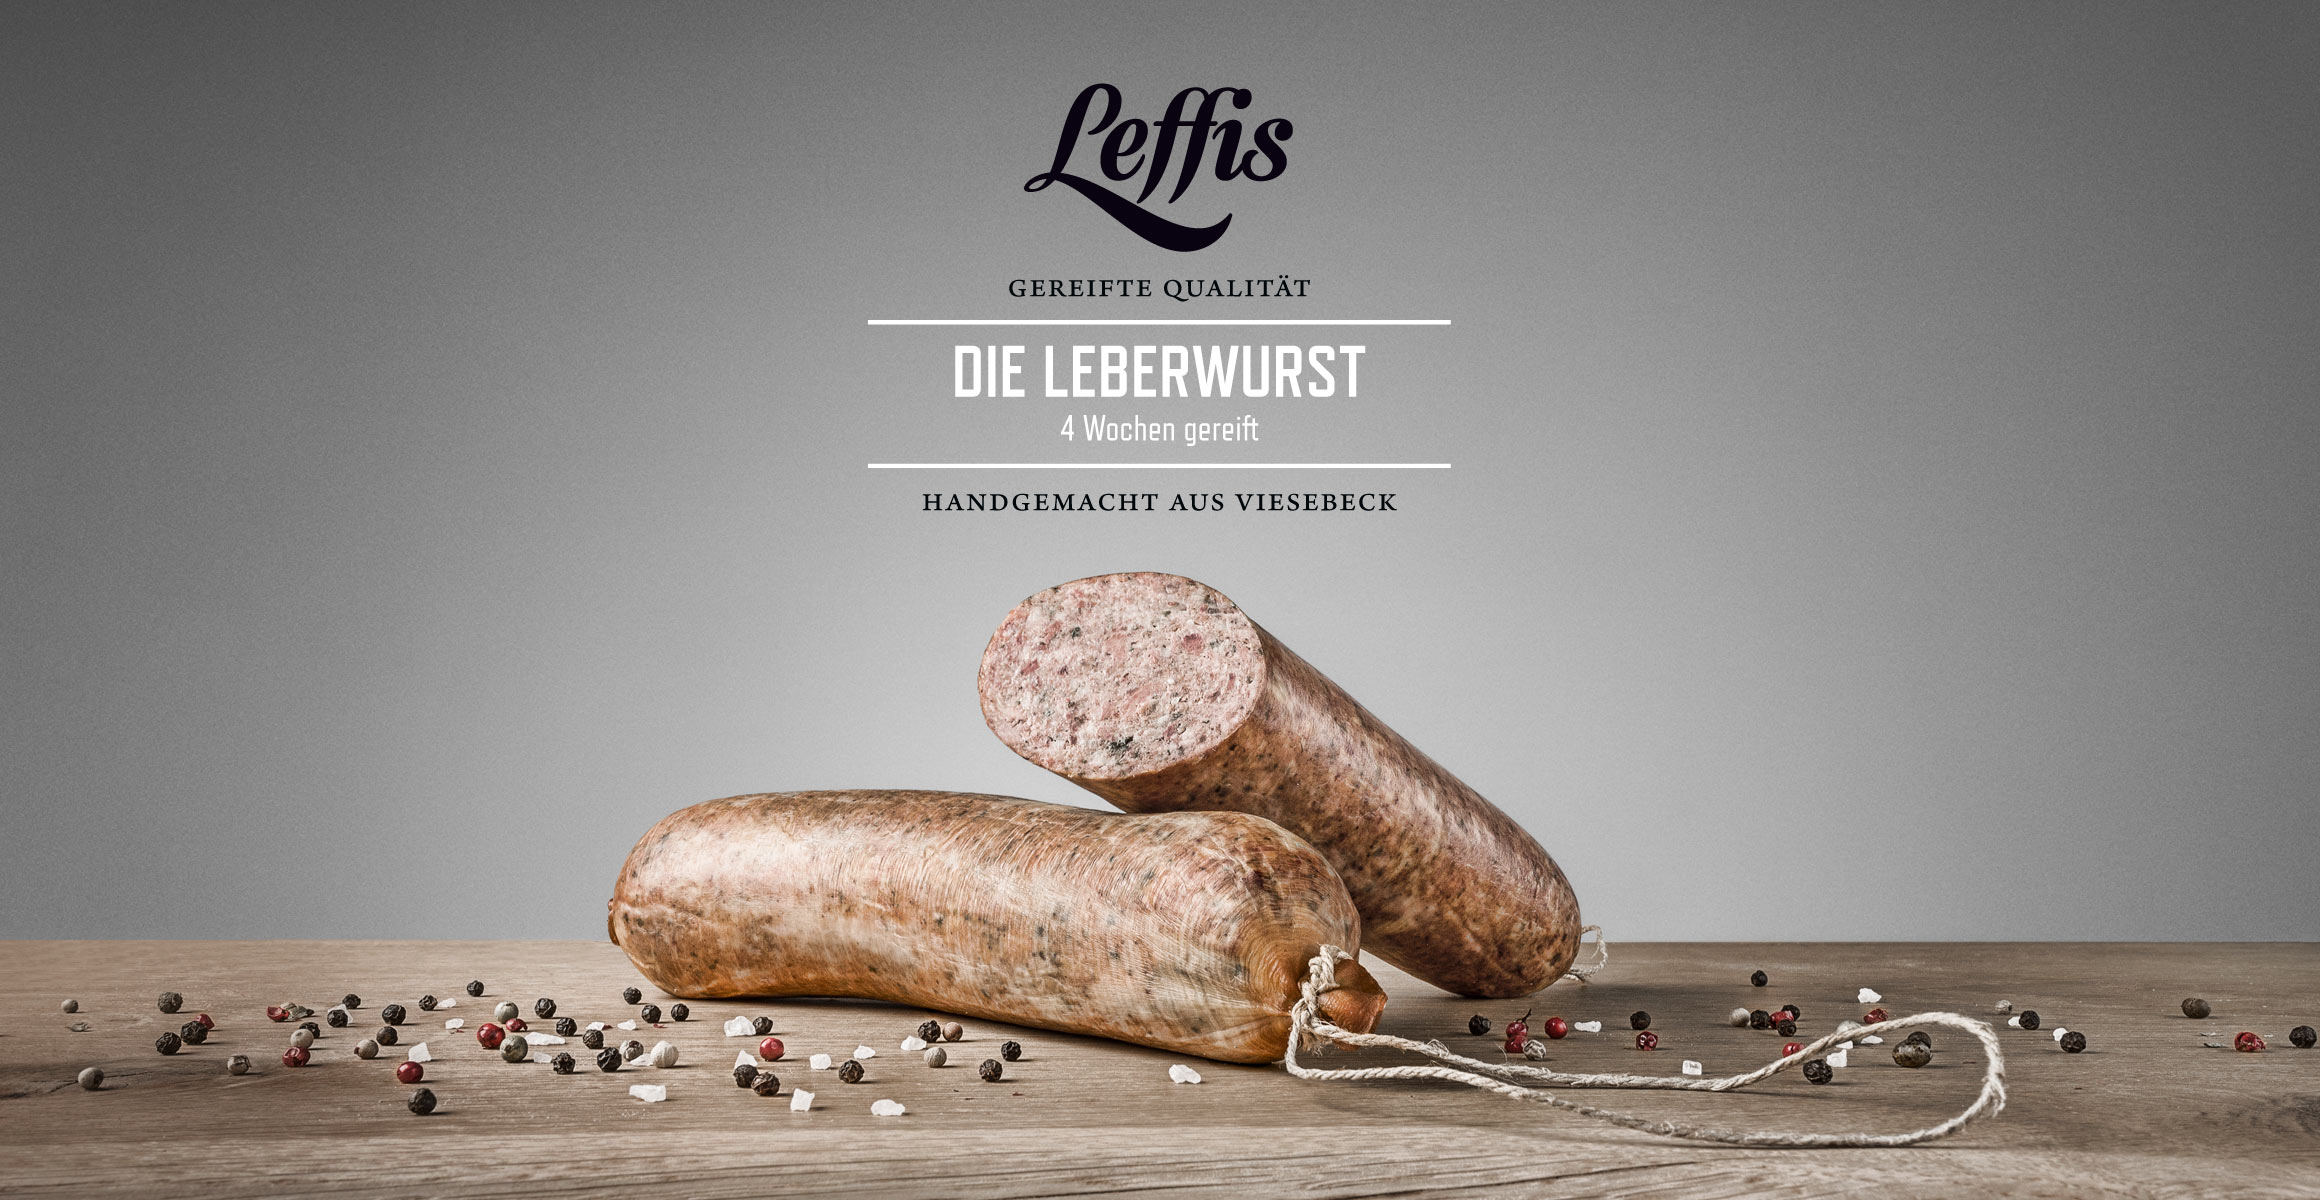 leberwurst_leffis_image_X2